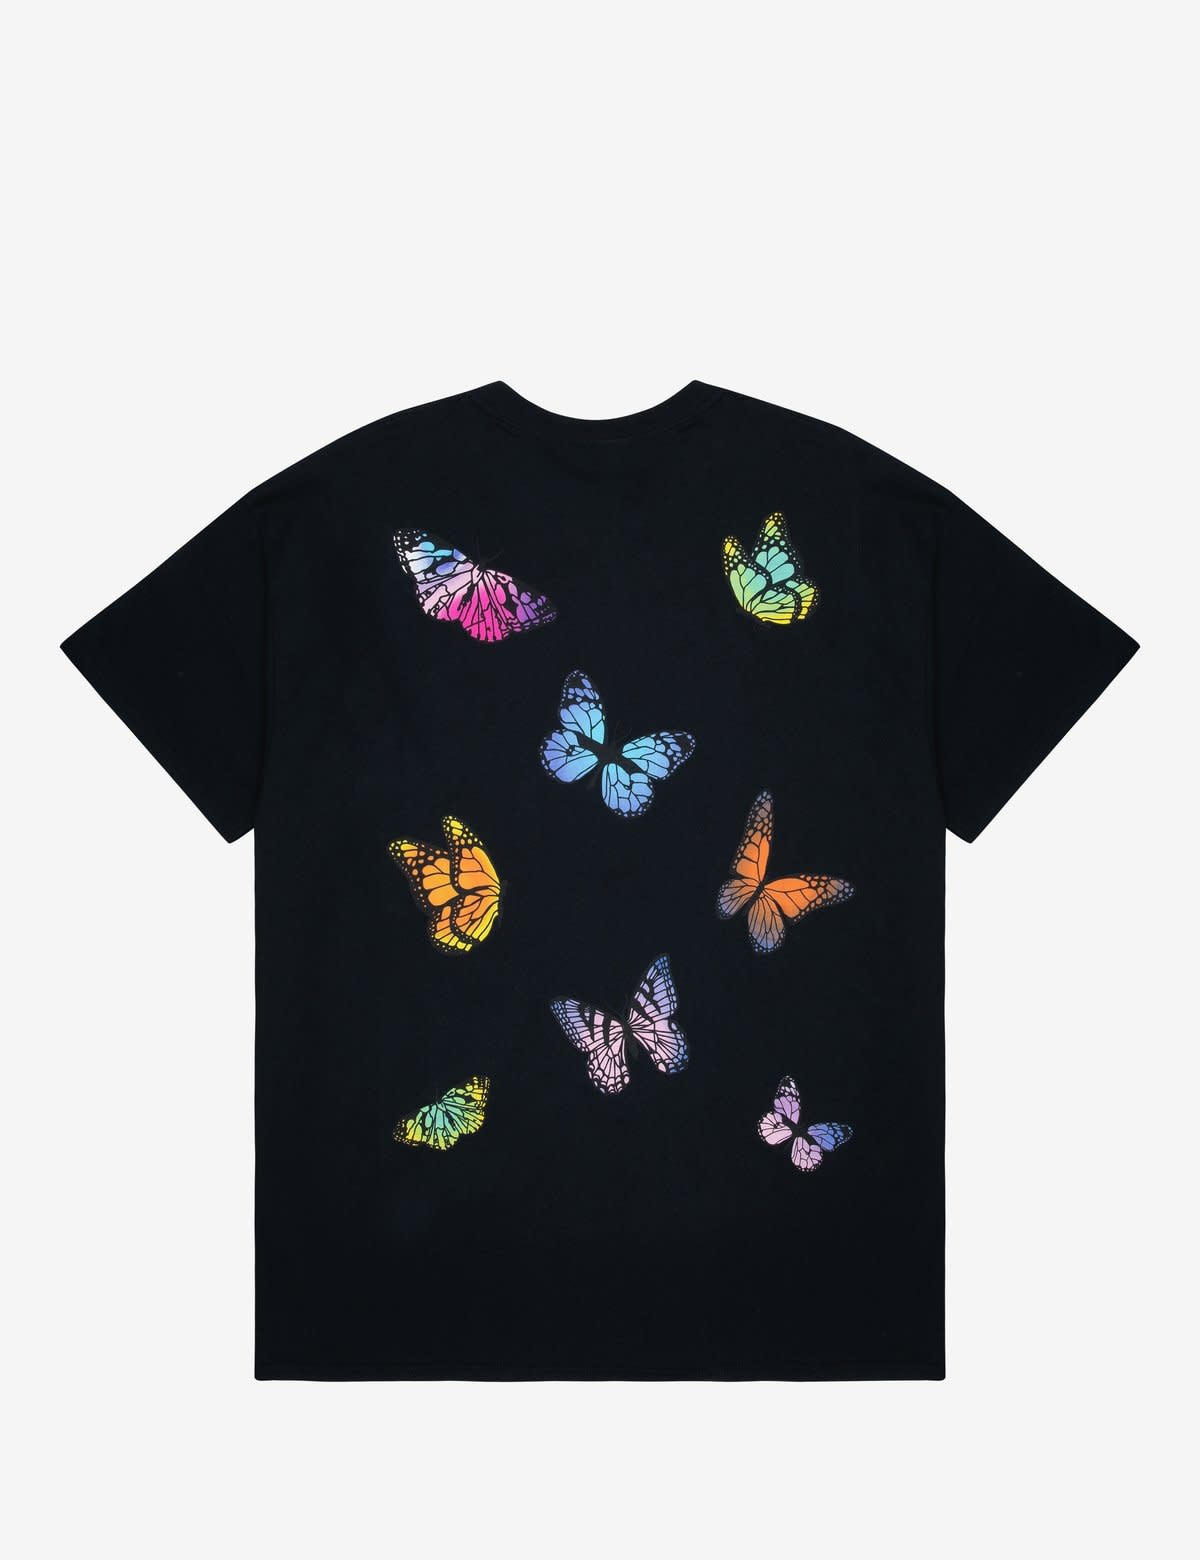 HNR LDN Honour Londen Butterfly Back Print Unisex Tee Black